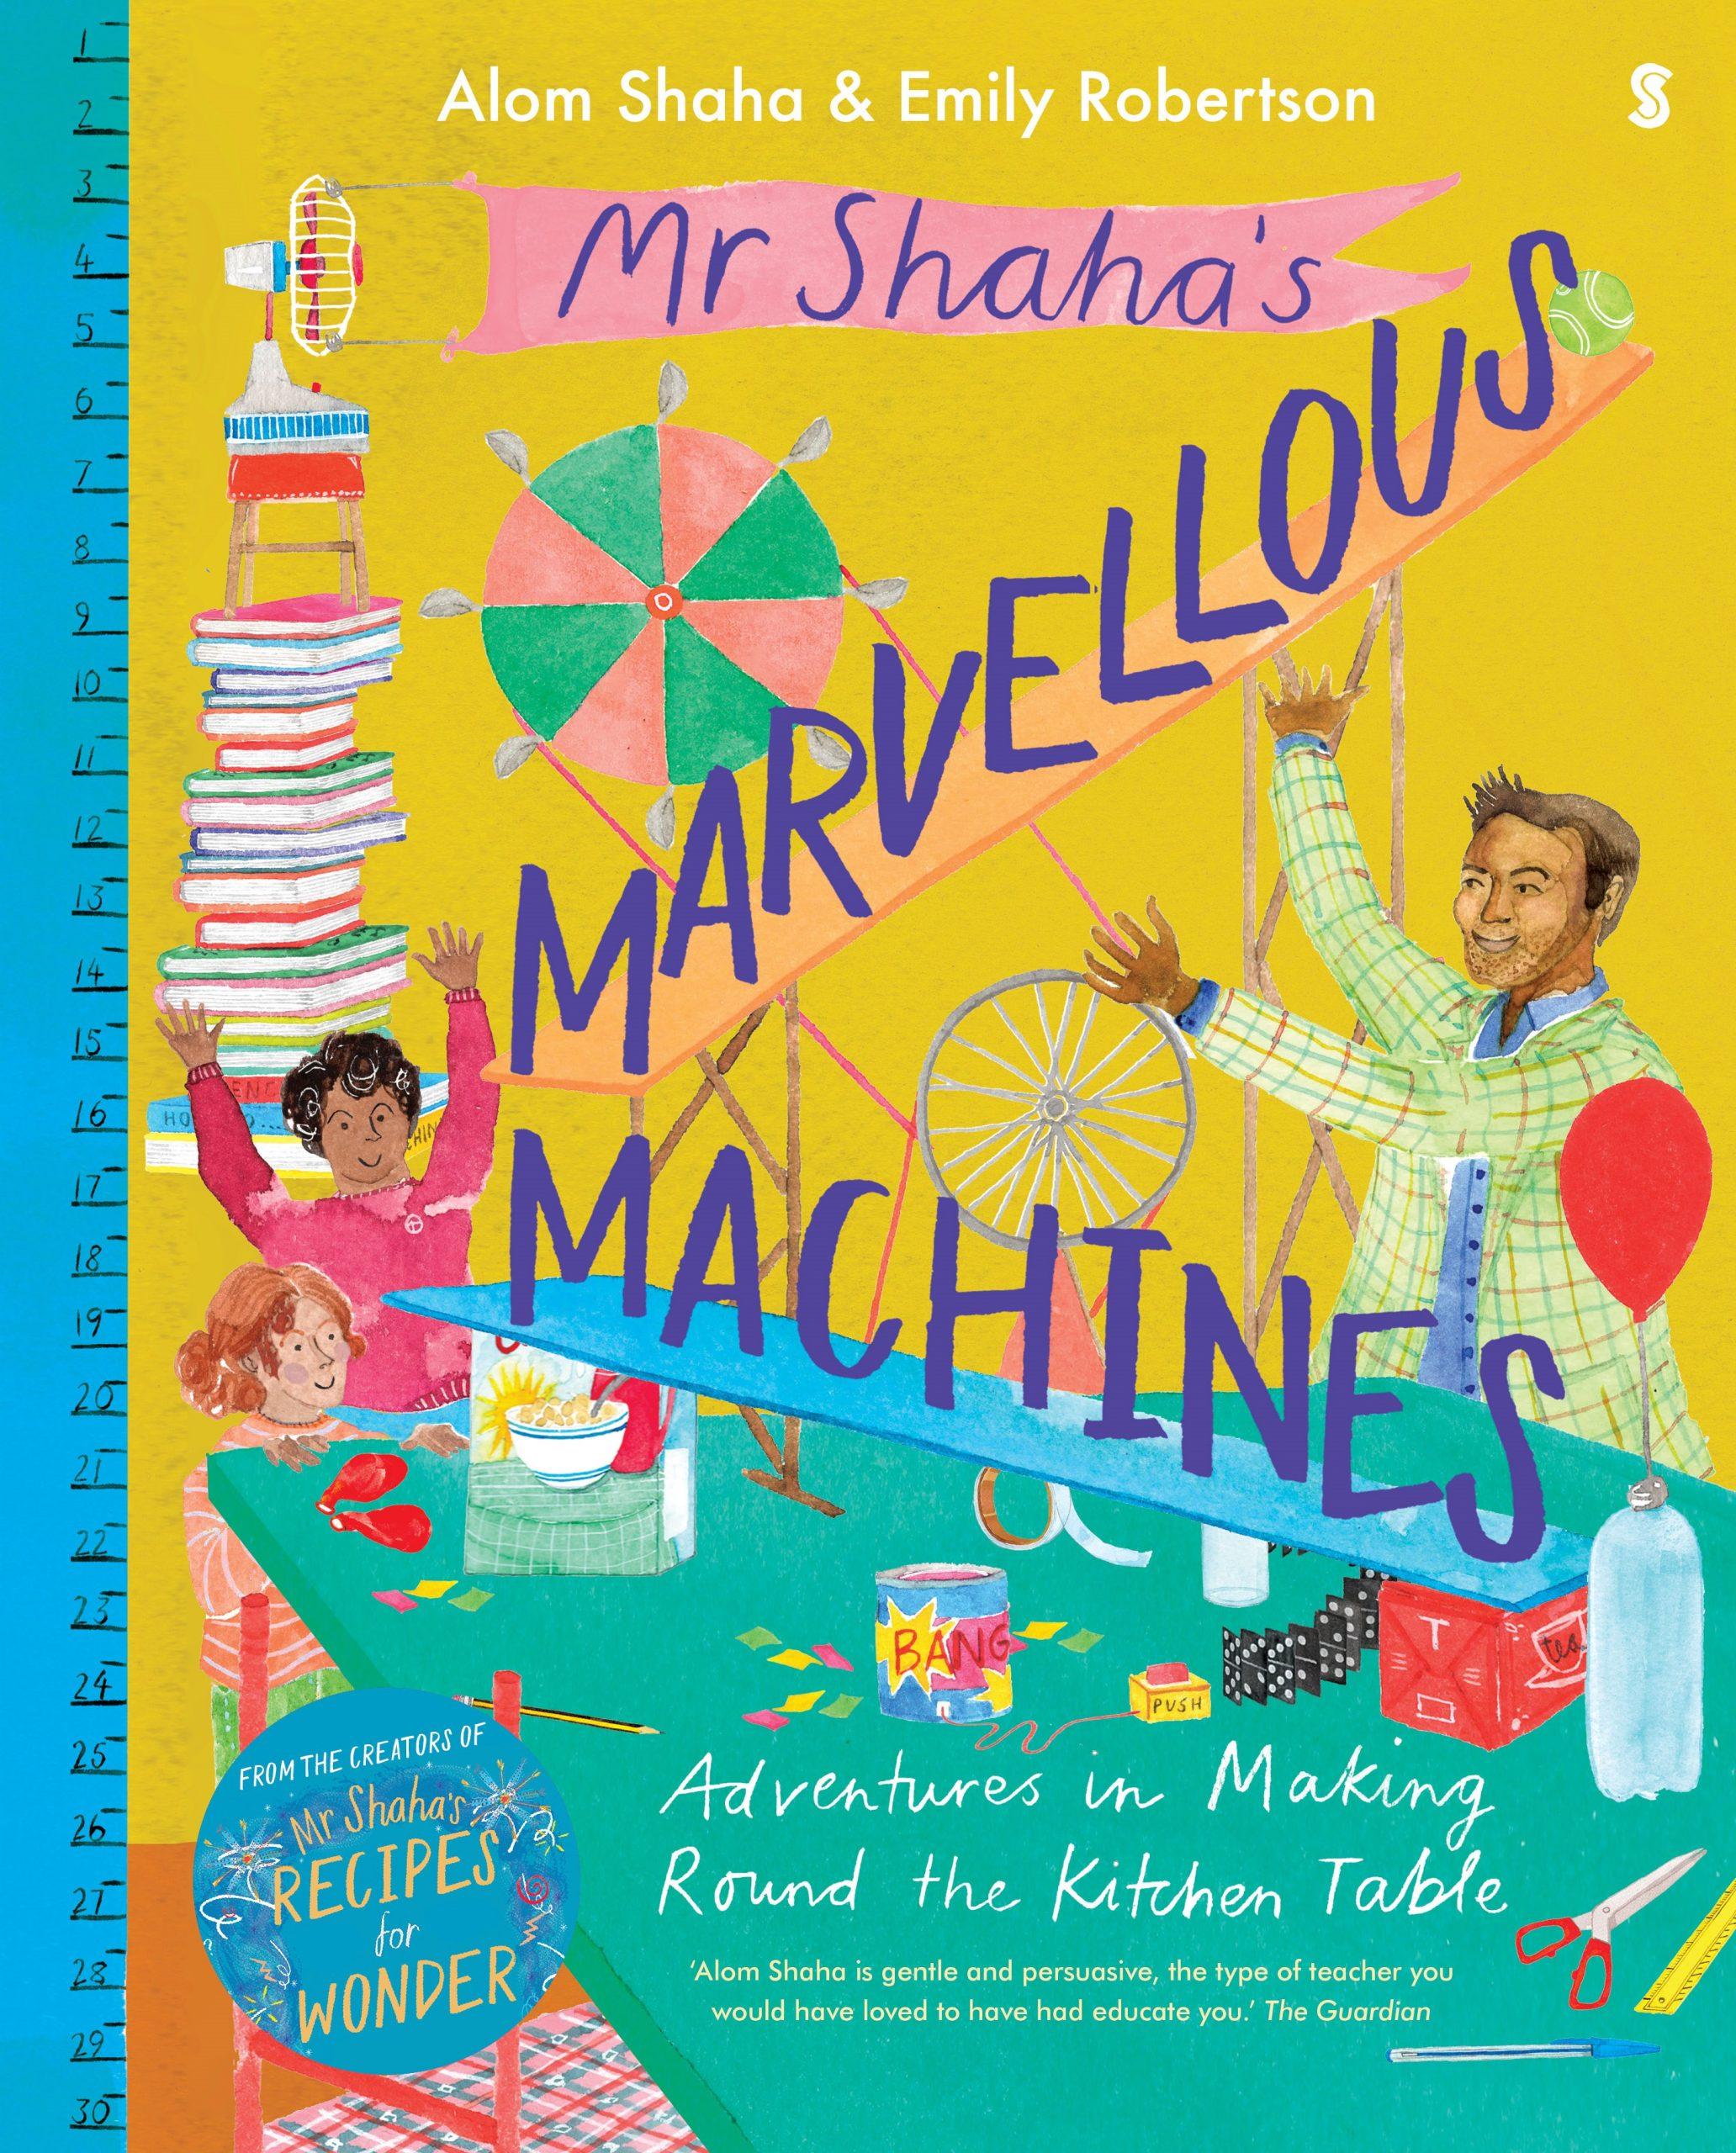 MR SHAHA MARVELOUS MACHINES cover